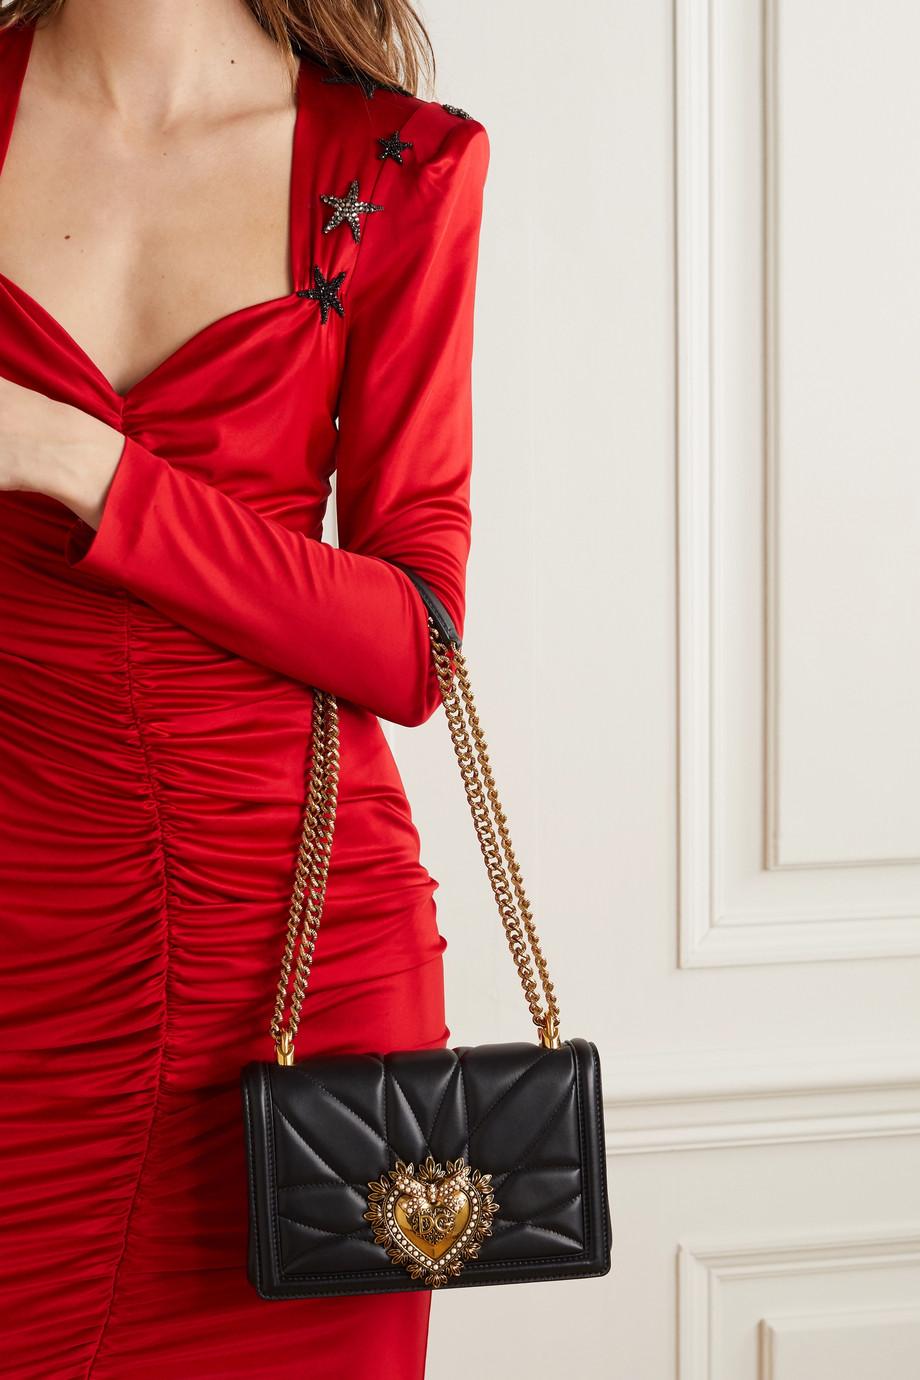 Dolce & Gabbana Devotion mini Schultertasche aus gestepptem Leder mit Verzierung